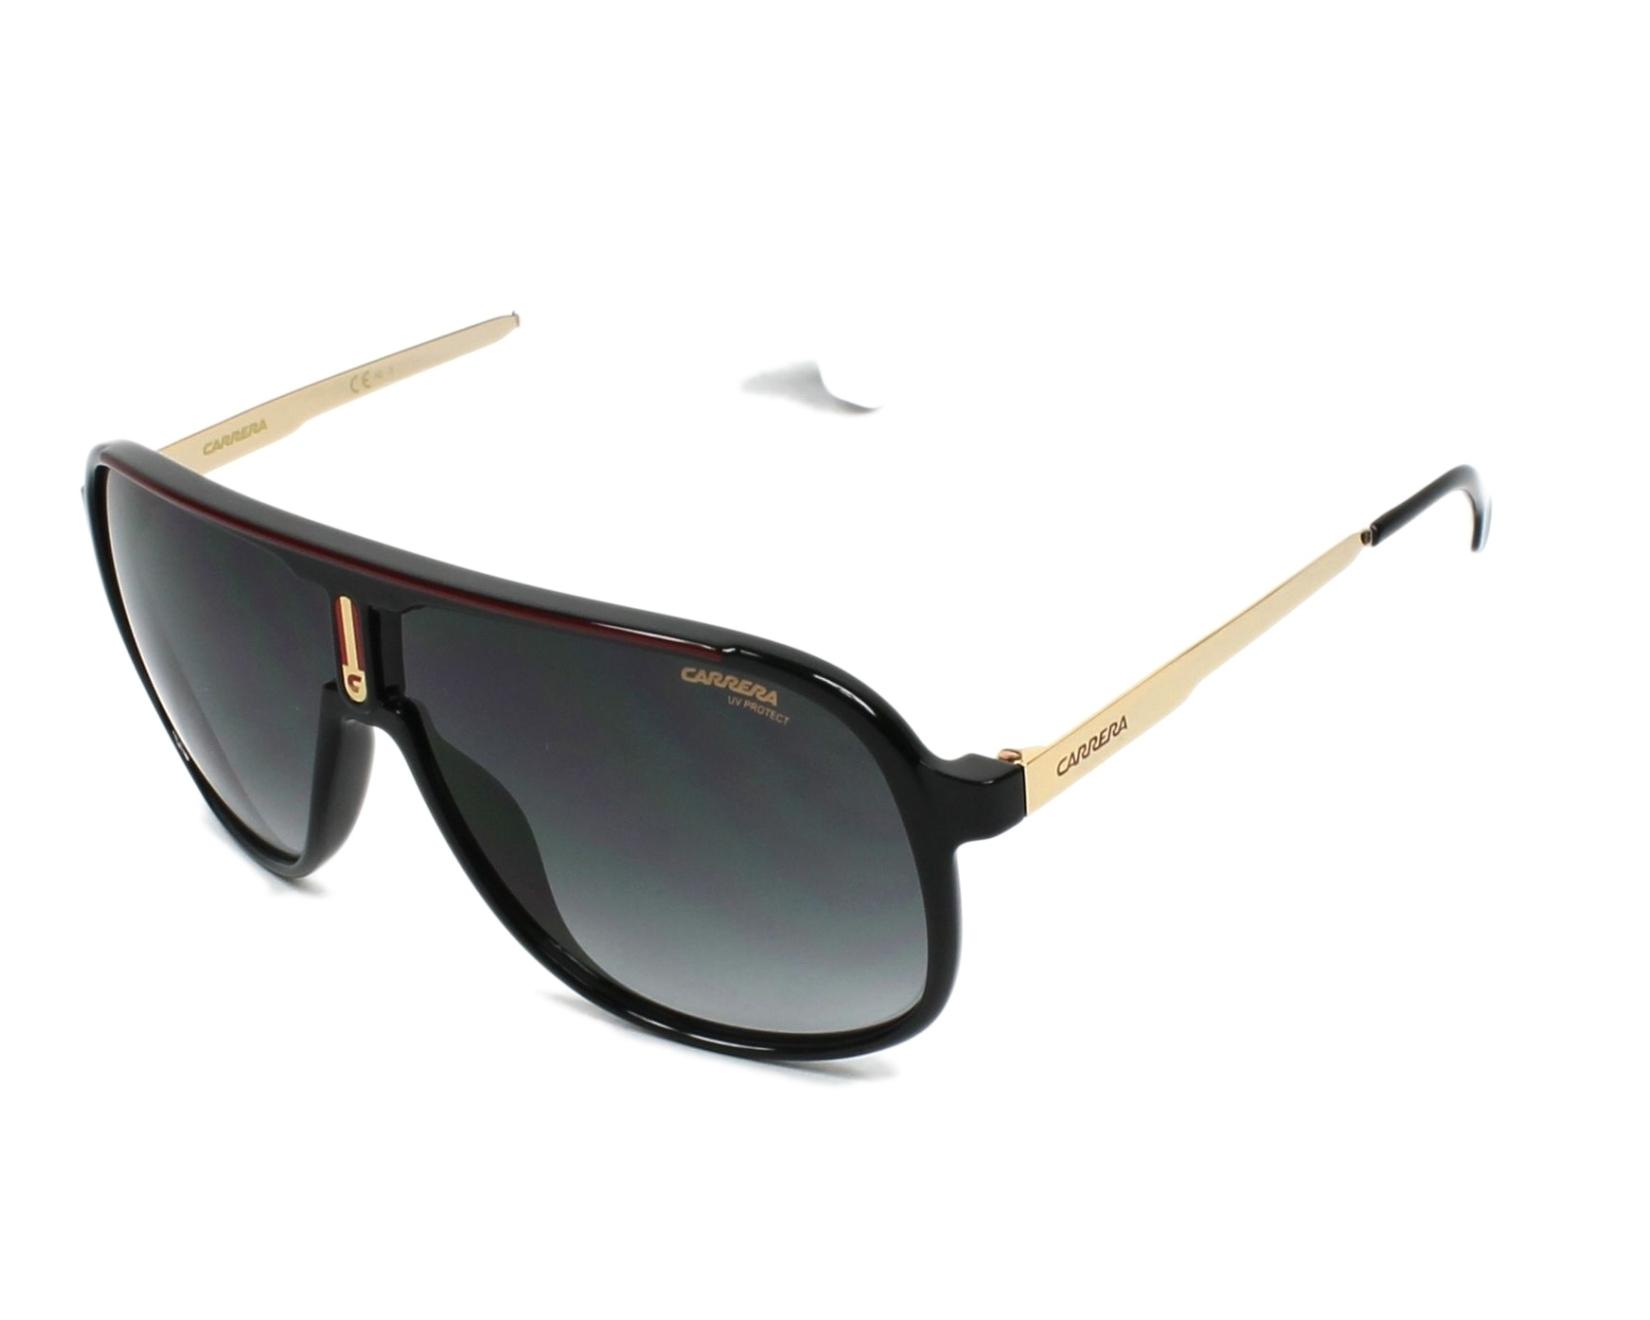 7e9af14fa0a21 Sunglasses Carrera 1007-S 807 9O 62-10 Black Gold profile view